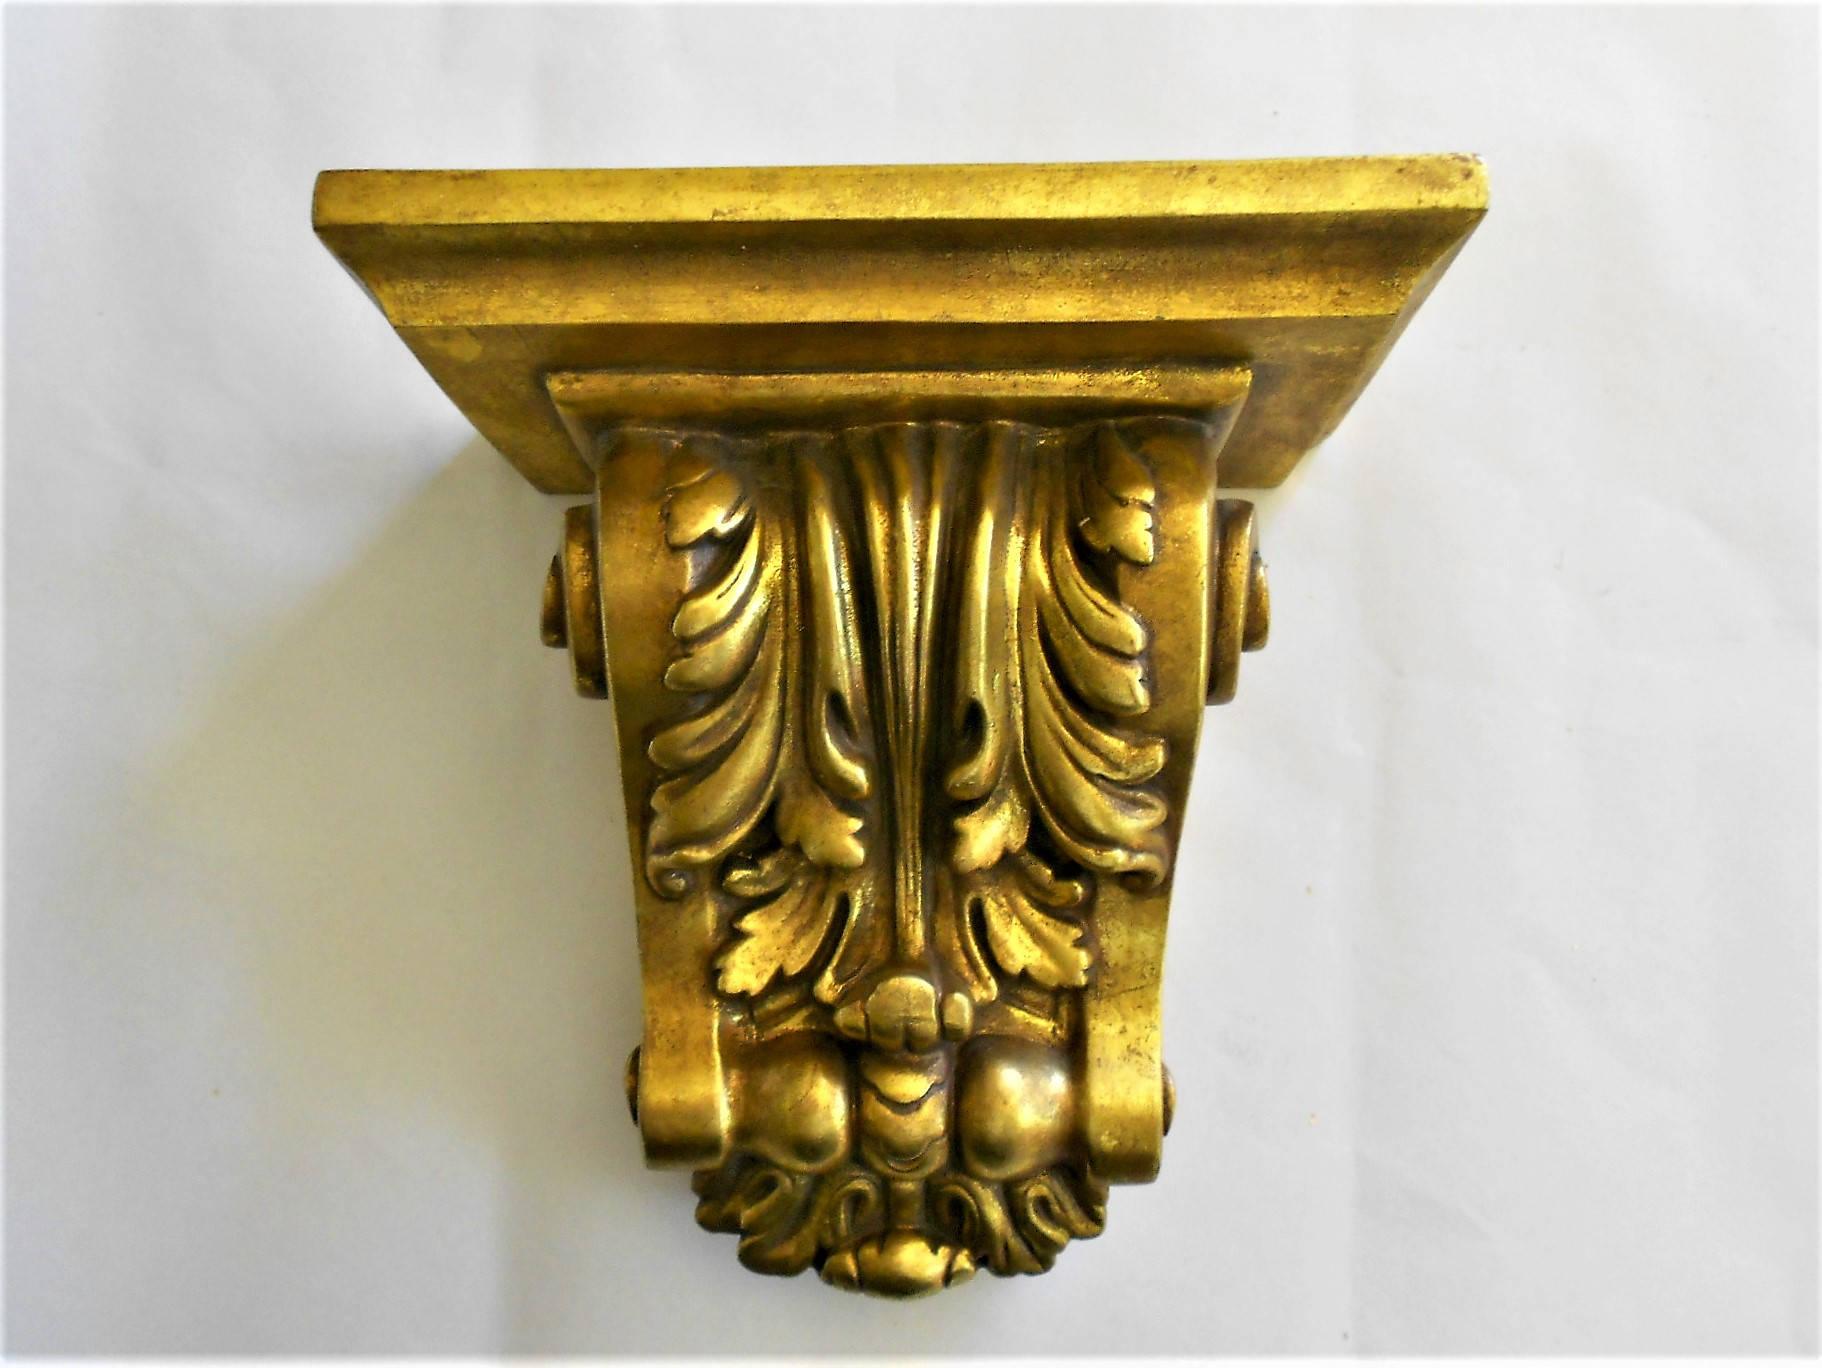 925hwall Shelf Sconce Decorative Sconce Wall Sconce Shelf Gold